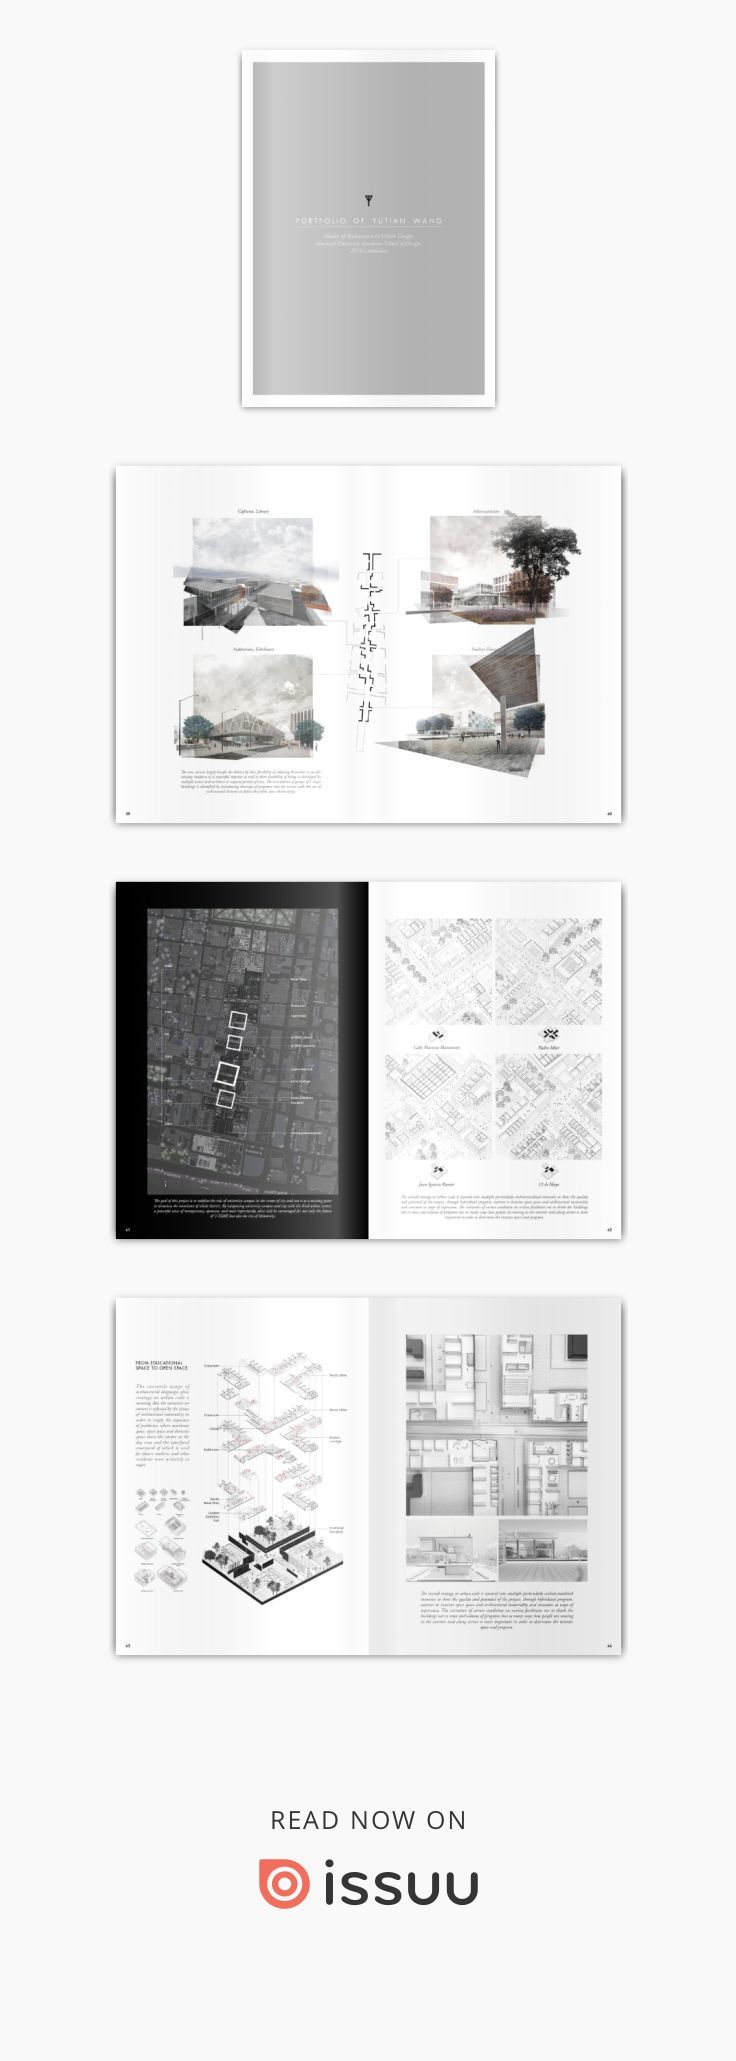 Portfolio of Yutian Wang  Harvard University Graduate School of Design, Master of Architecture in Urban Design, 2016 Instagram: Yutianwang Website: www.yutian-wang.com